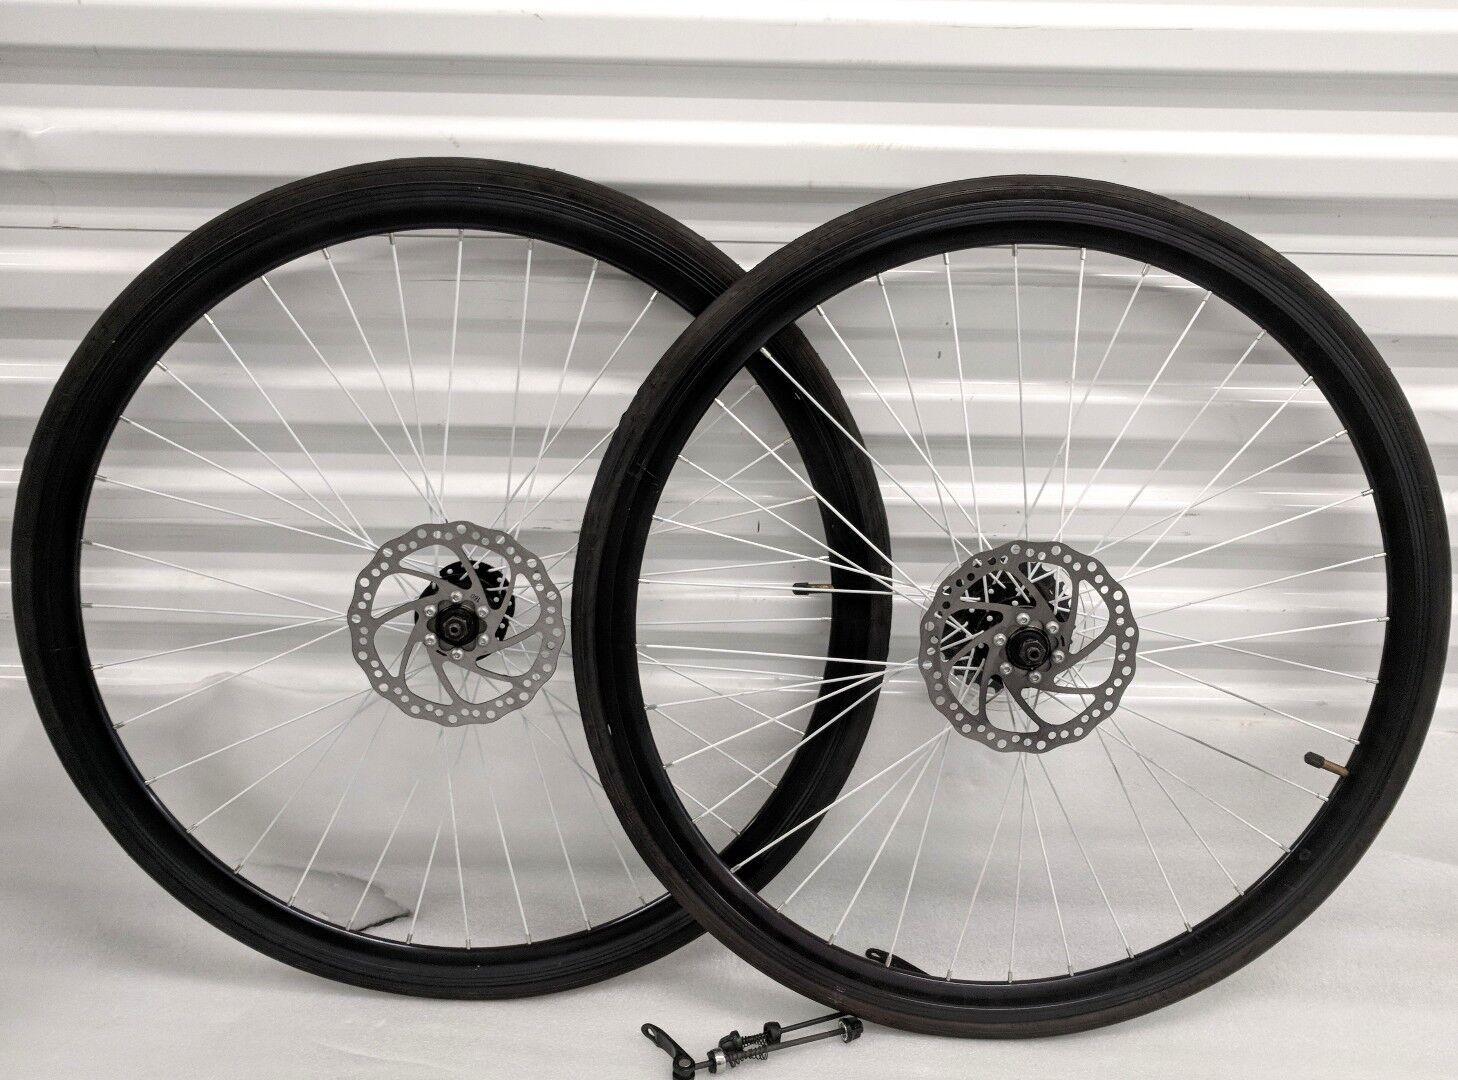 700c Bicicleta Carretera Ruedas con 7speed Cog ✓ Neumático Tubo ✓ Reflector ✓